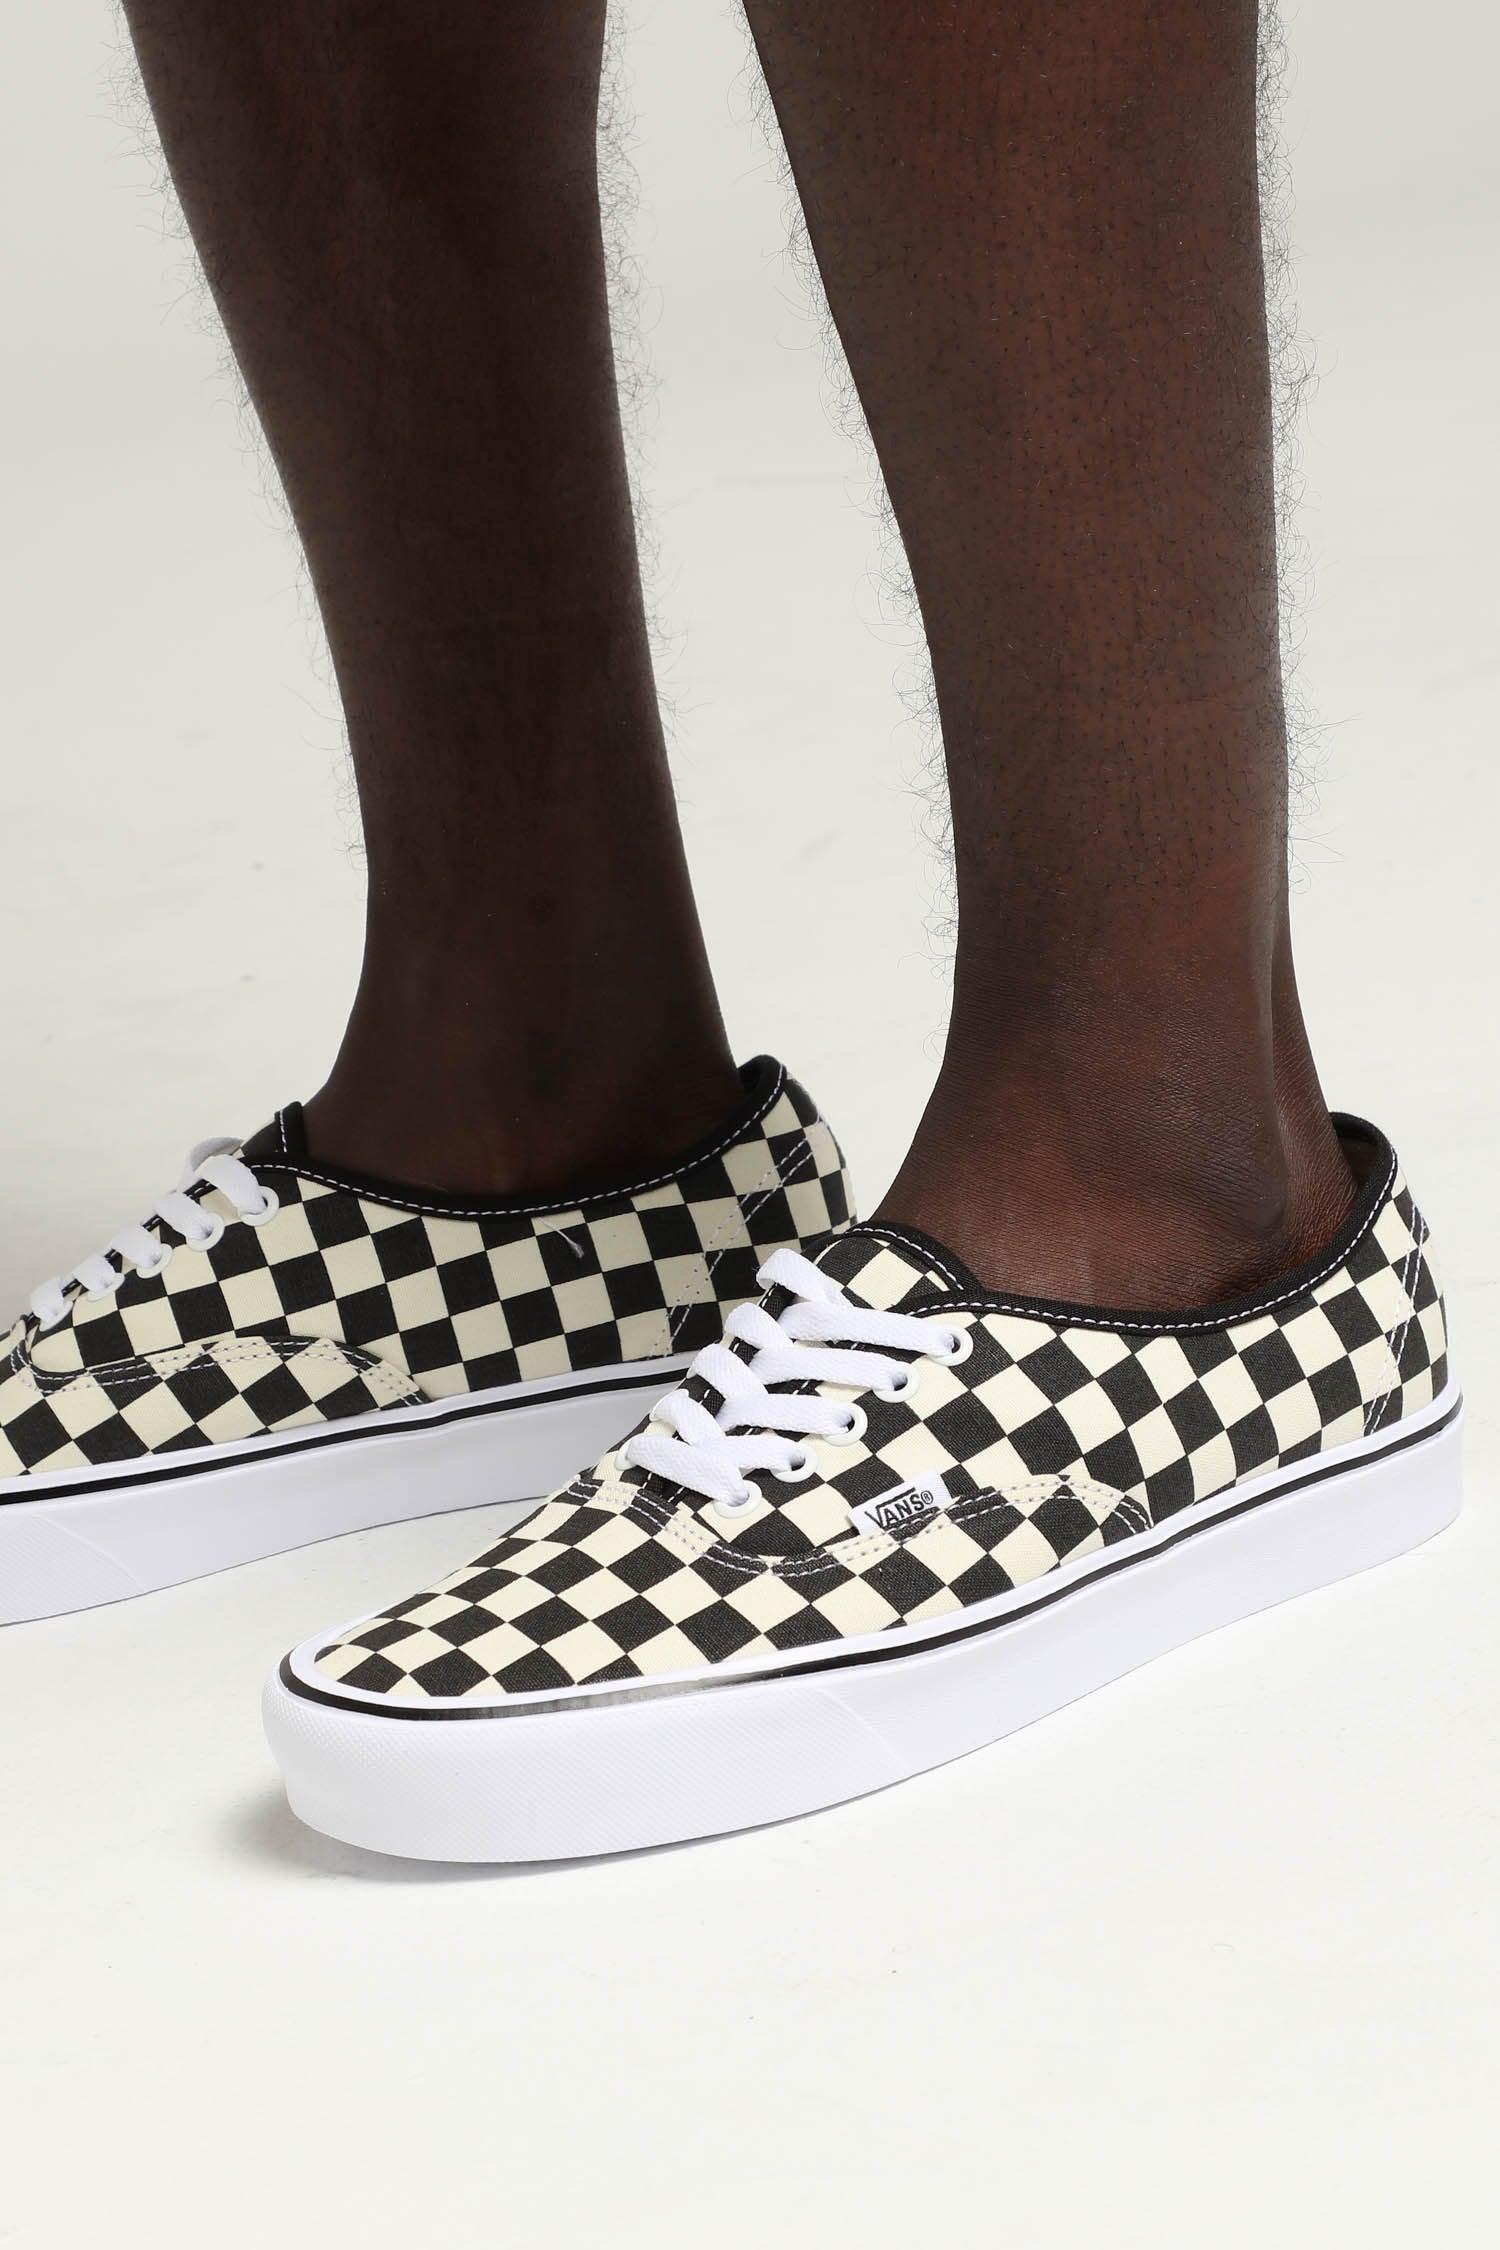 Vans Authentic LITE (Checkerboard